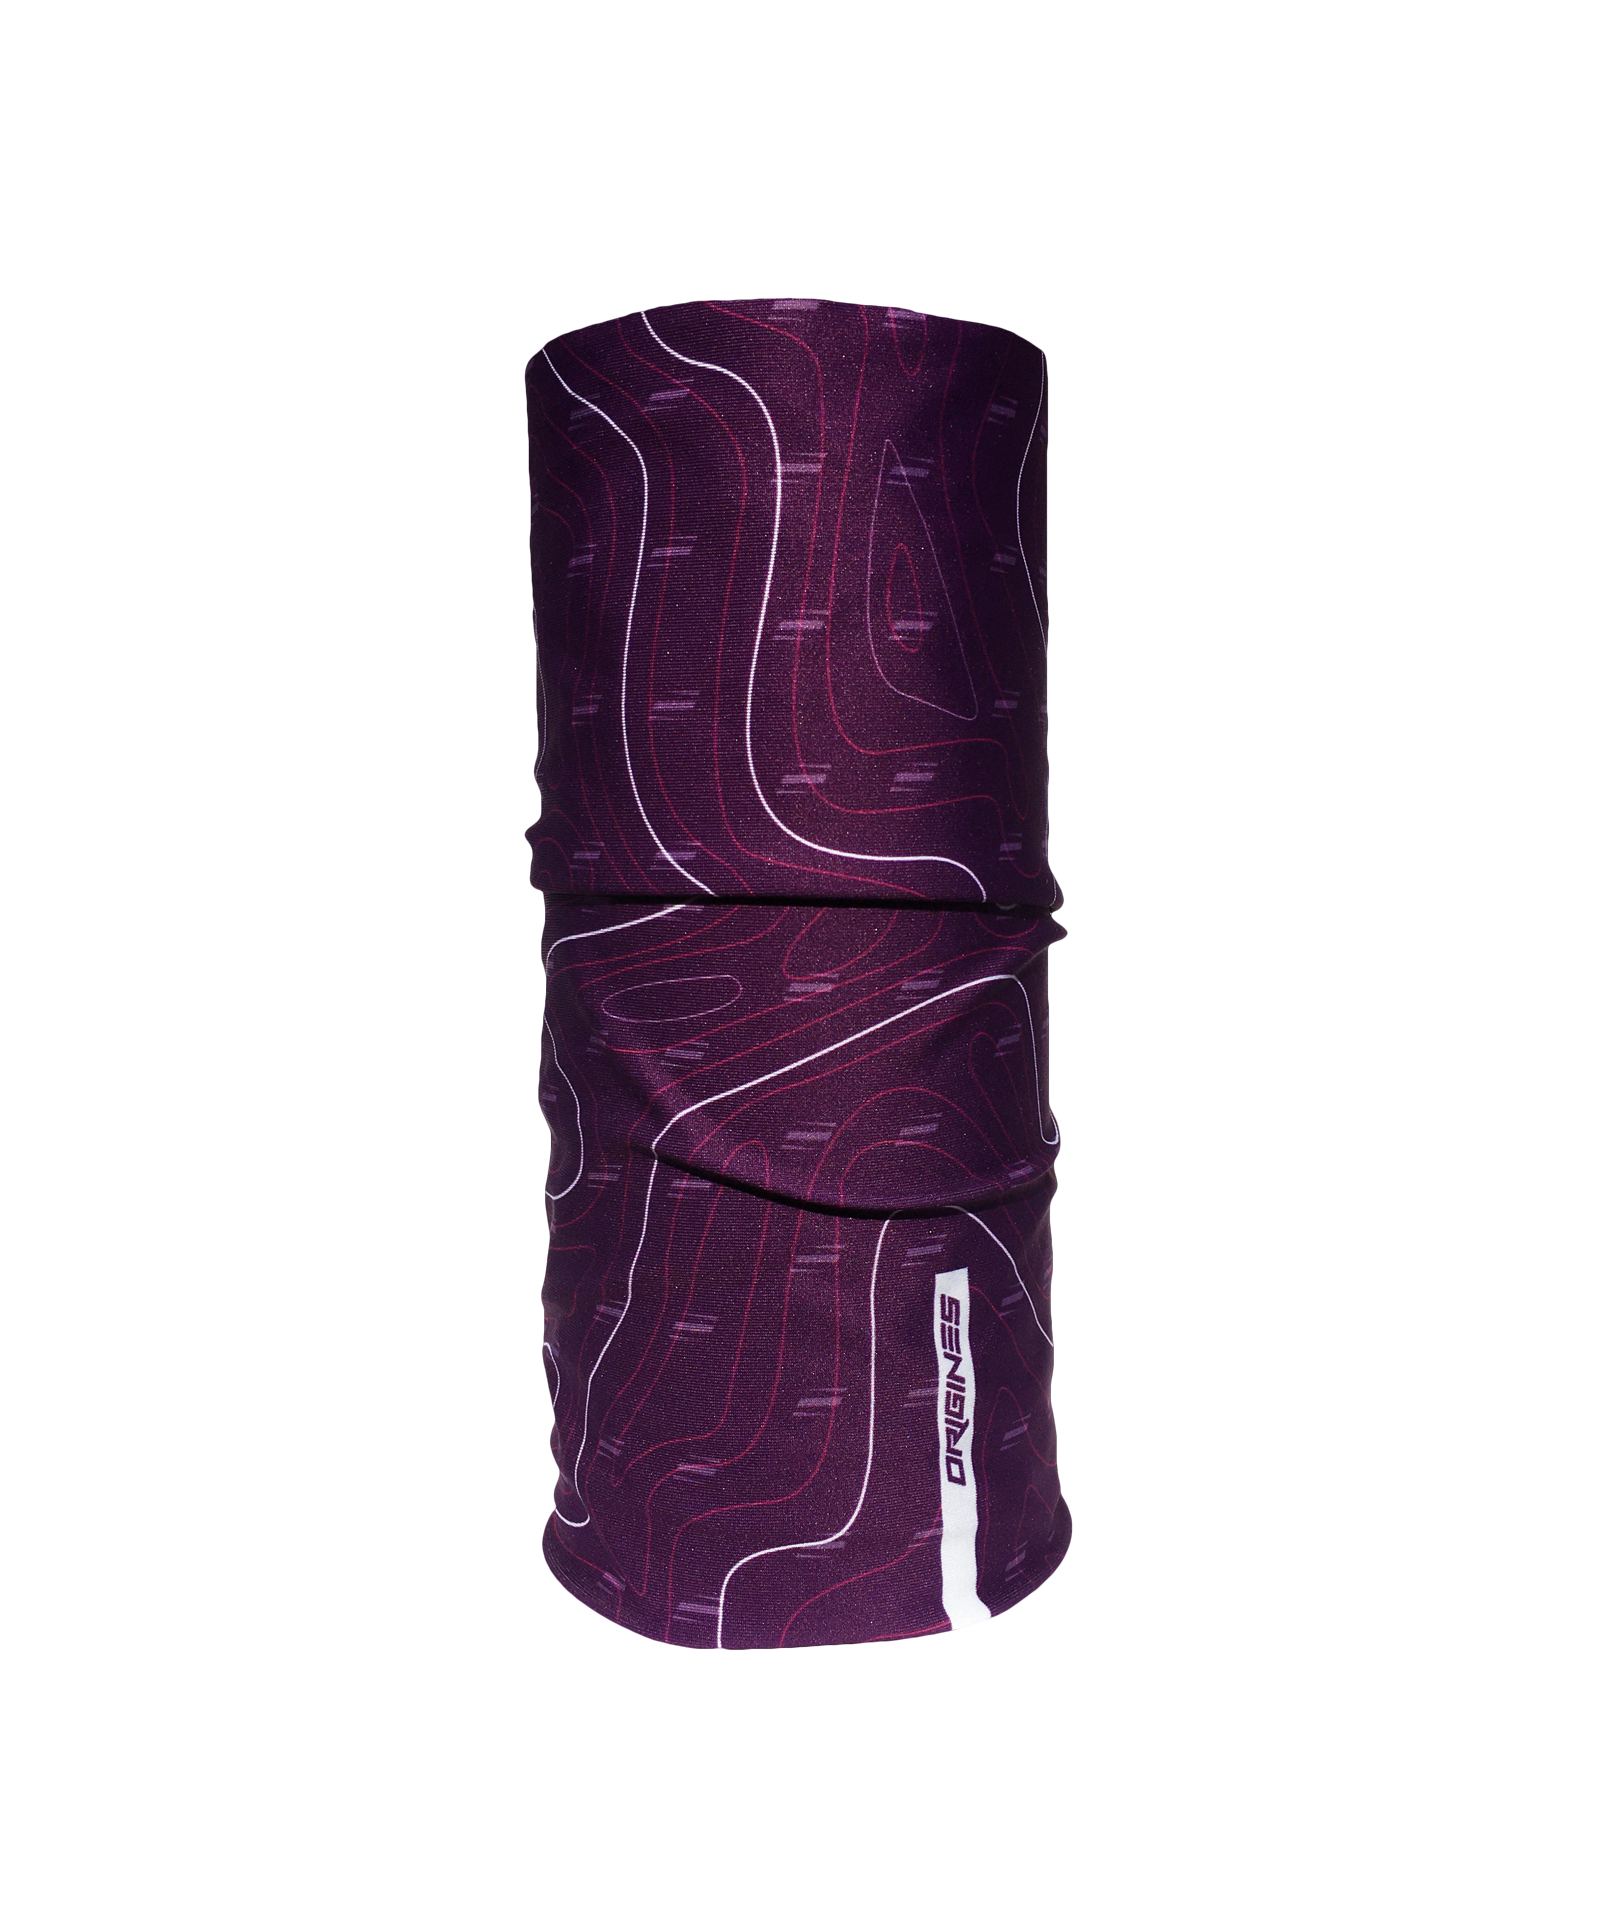 Neckwarmer origines clothing purple topo